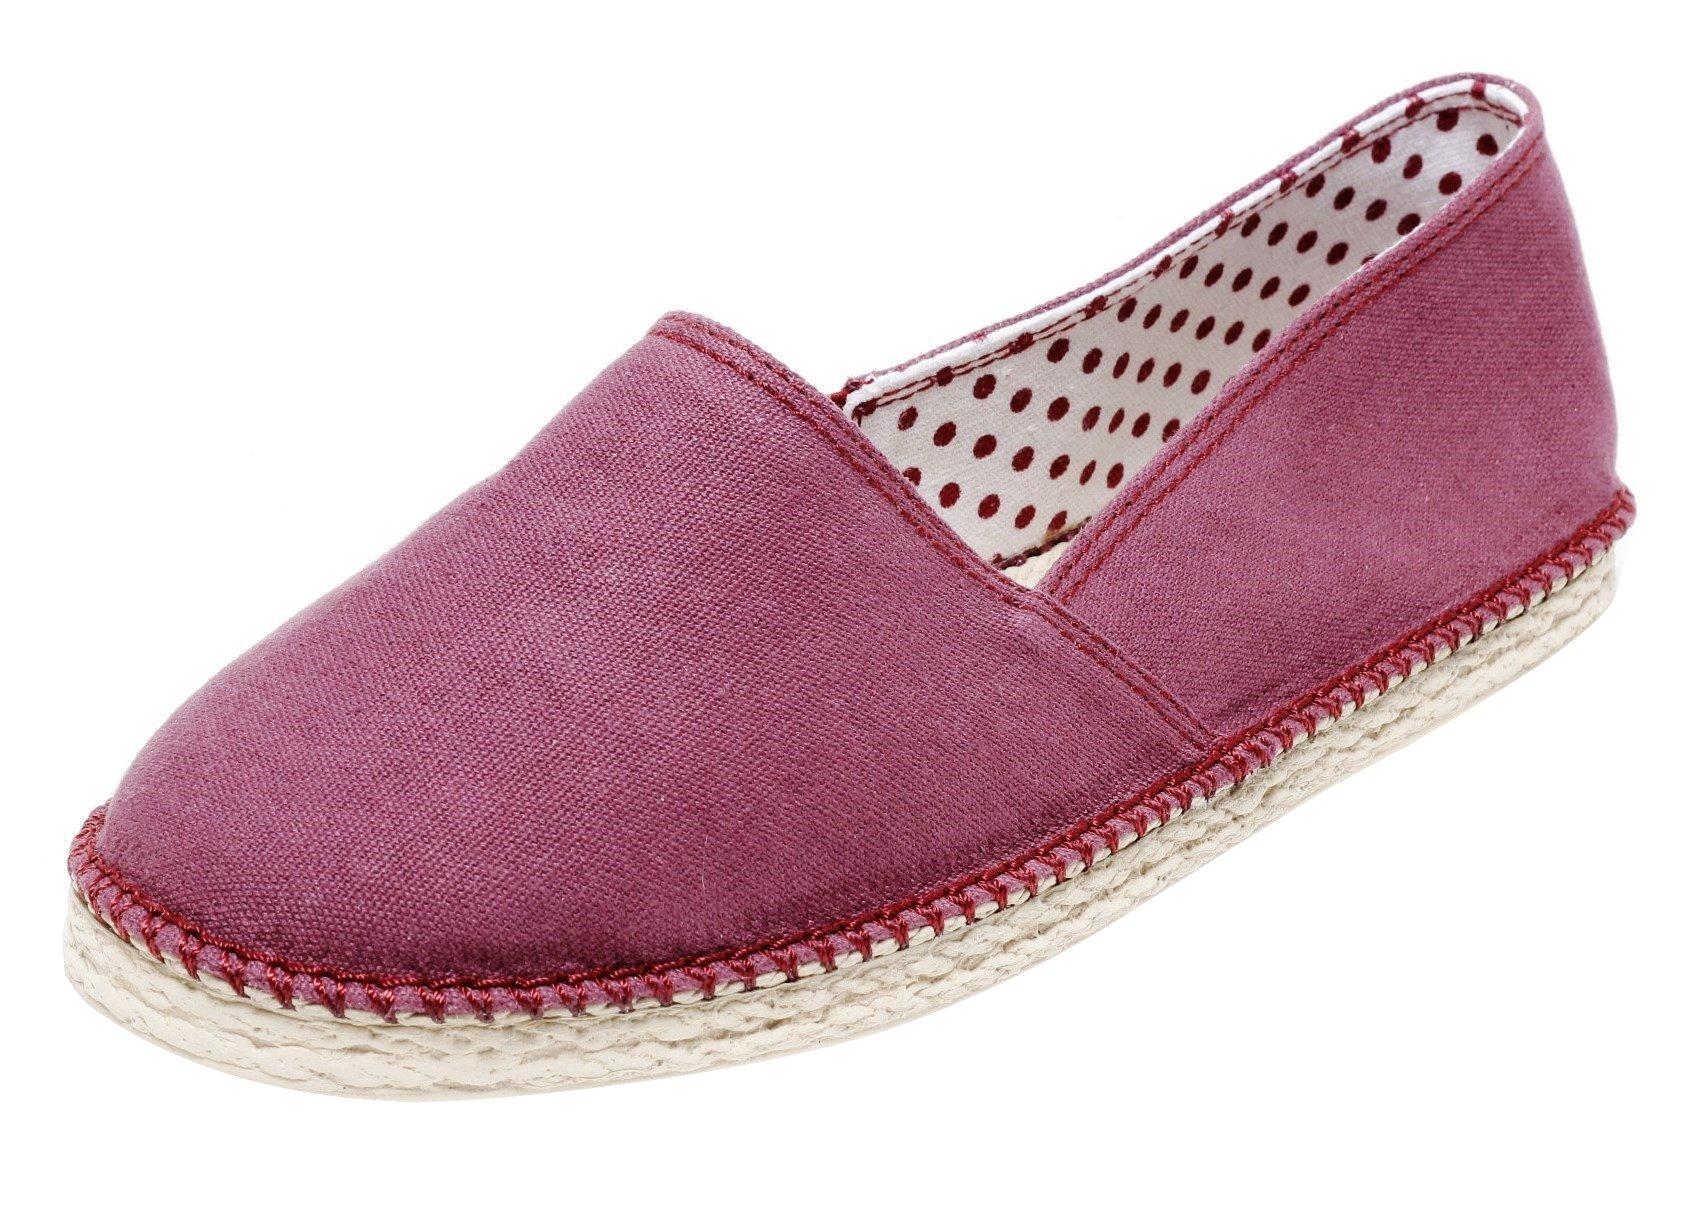 separation shoes 283b6 61b8c Mädchen Damen Sommer Slipper Stoffschuhe Gr.37-41 Espadrilles Pantolette  rot | dynamic-24.de